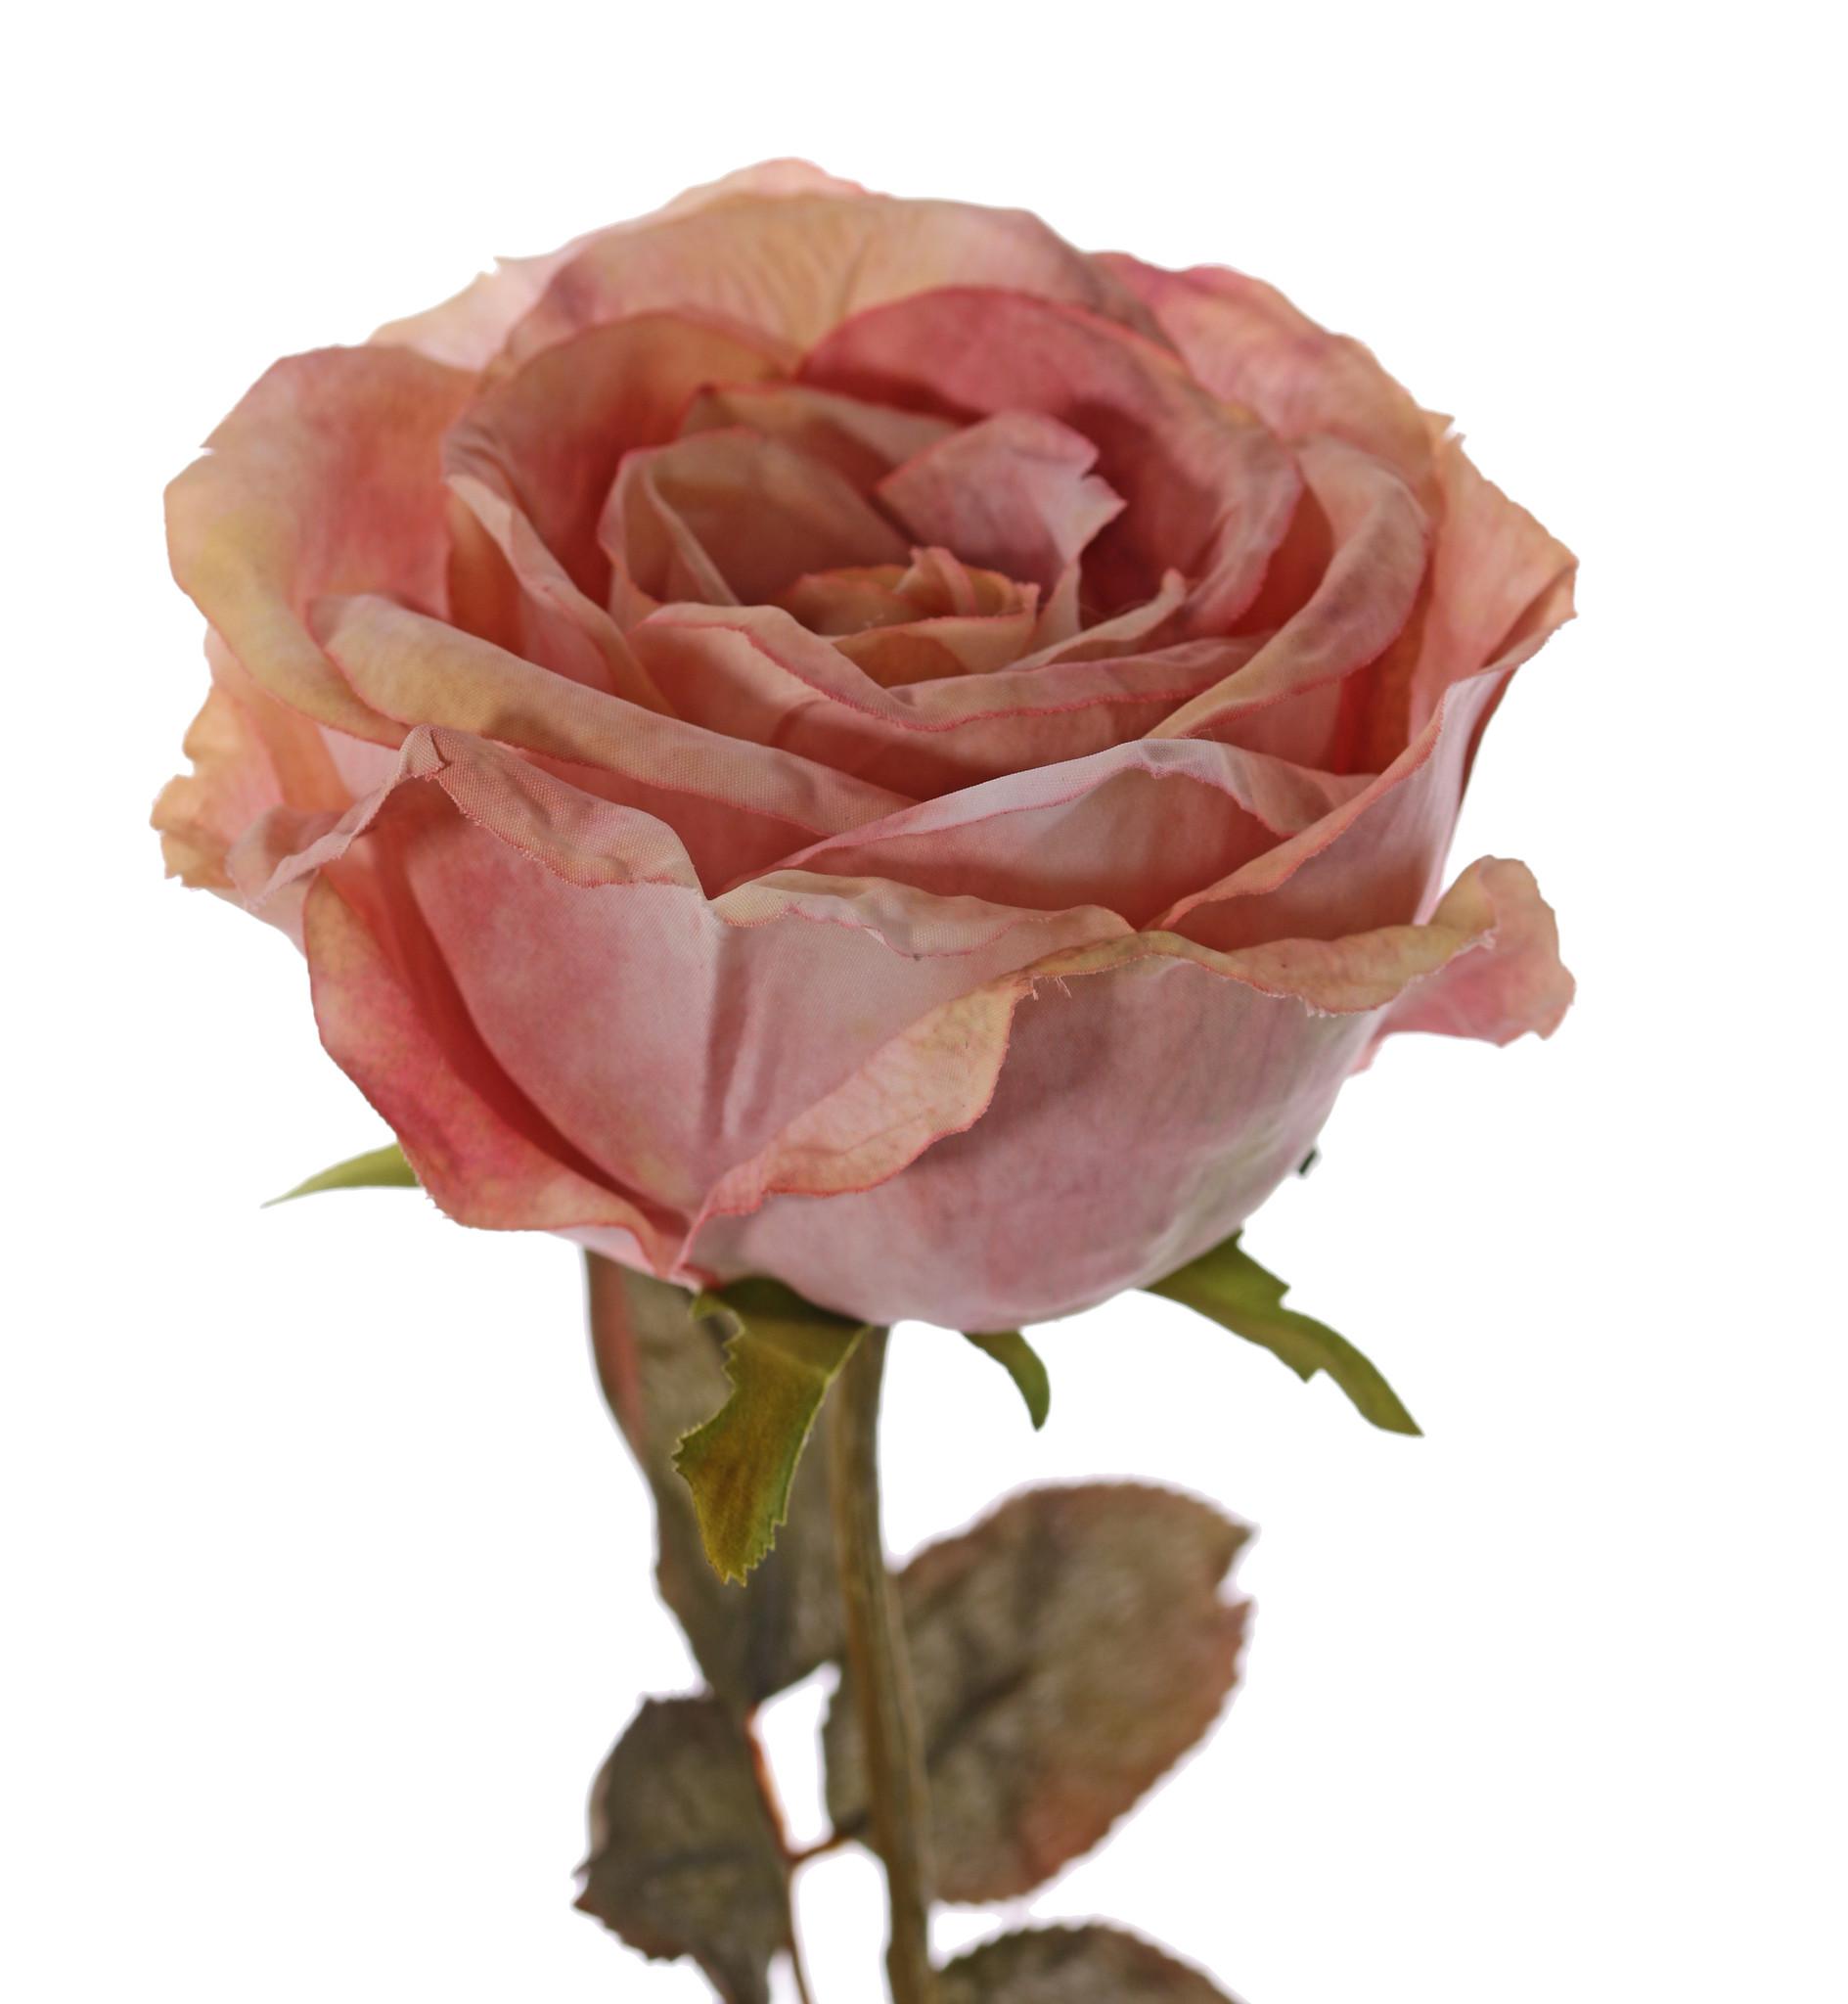 Rose Calista, Ø 11cm, H.7cm, 2 Blattsets (10 Blätter), 66cm